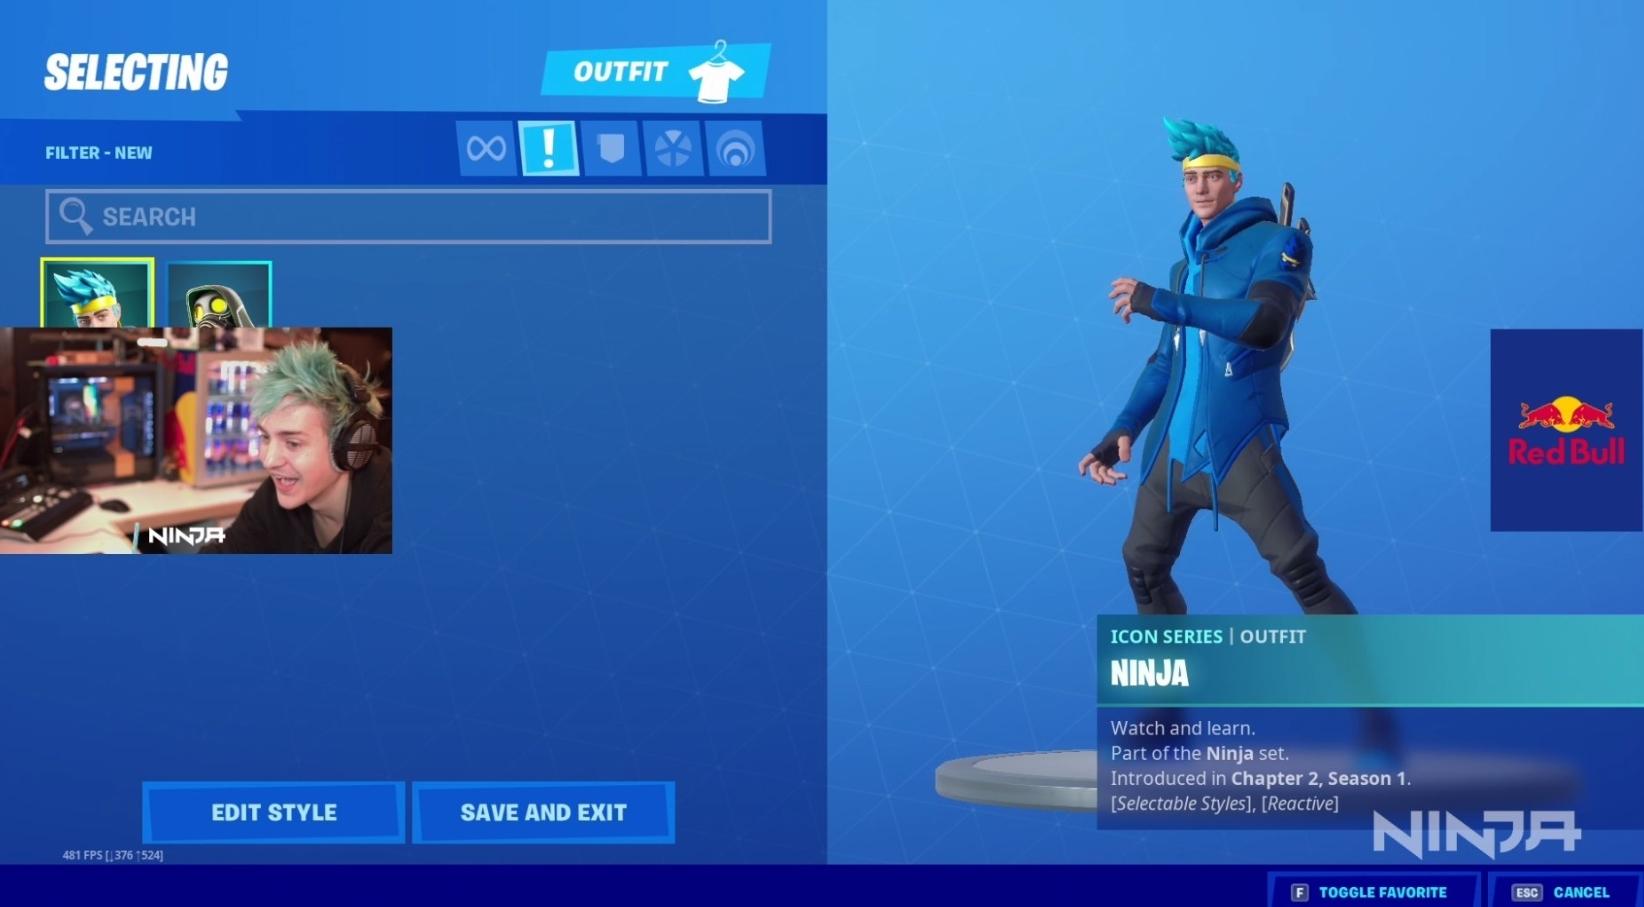 Ninja qui présente son skin sur Fortnite